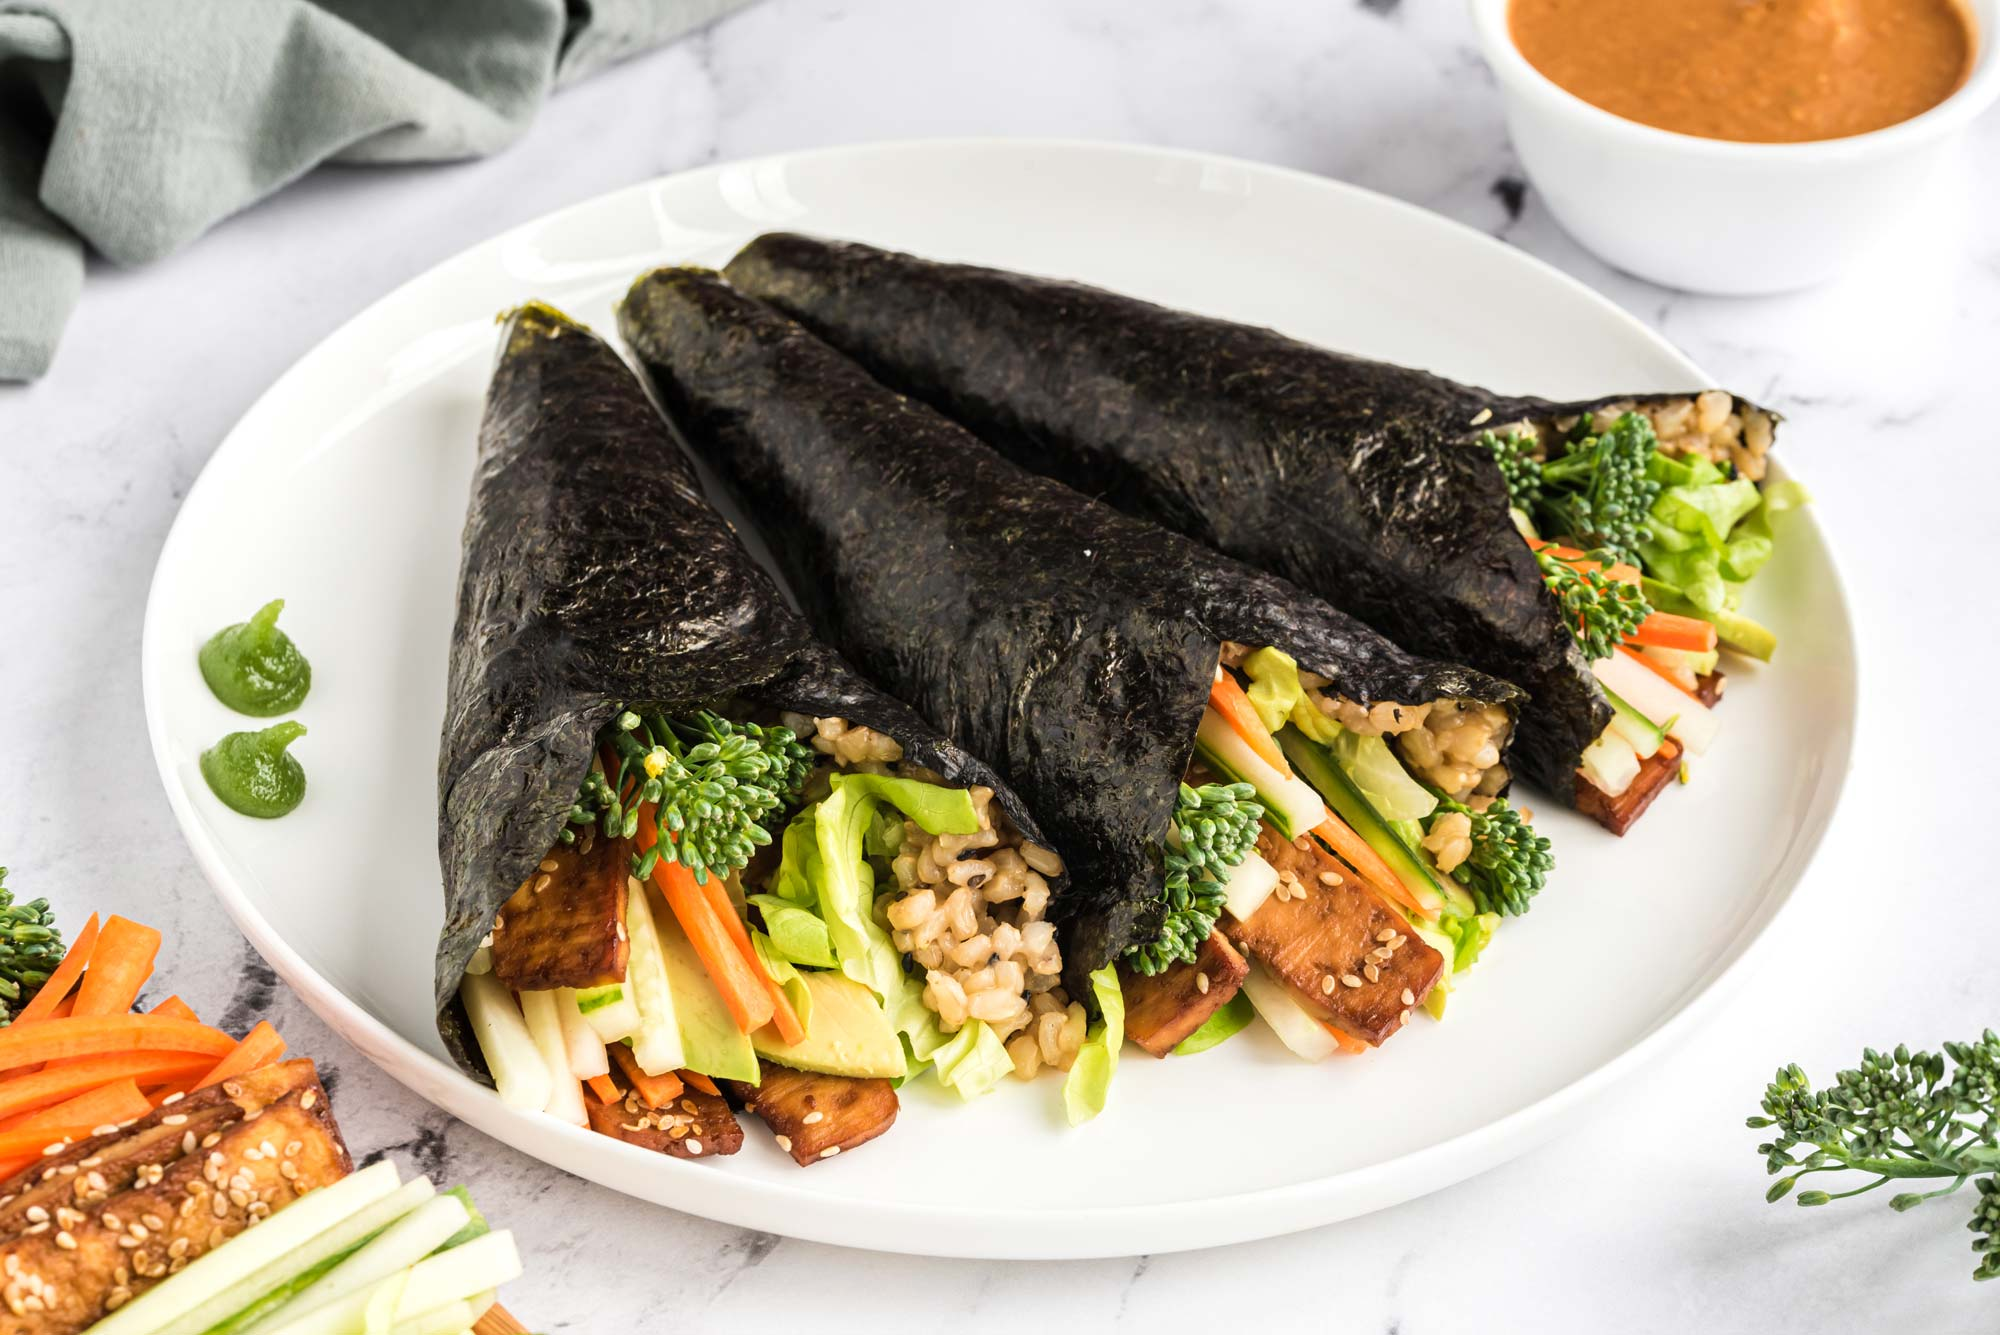 vegetable hand rolls on plate